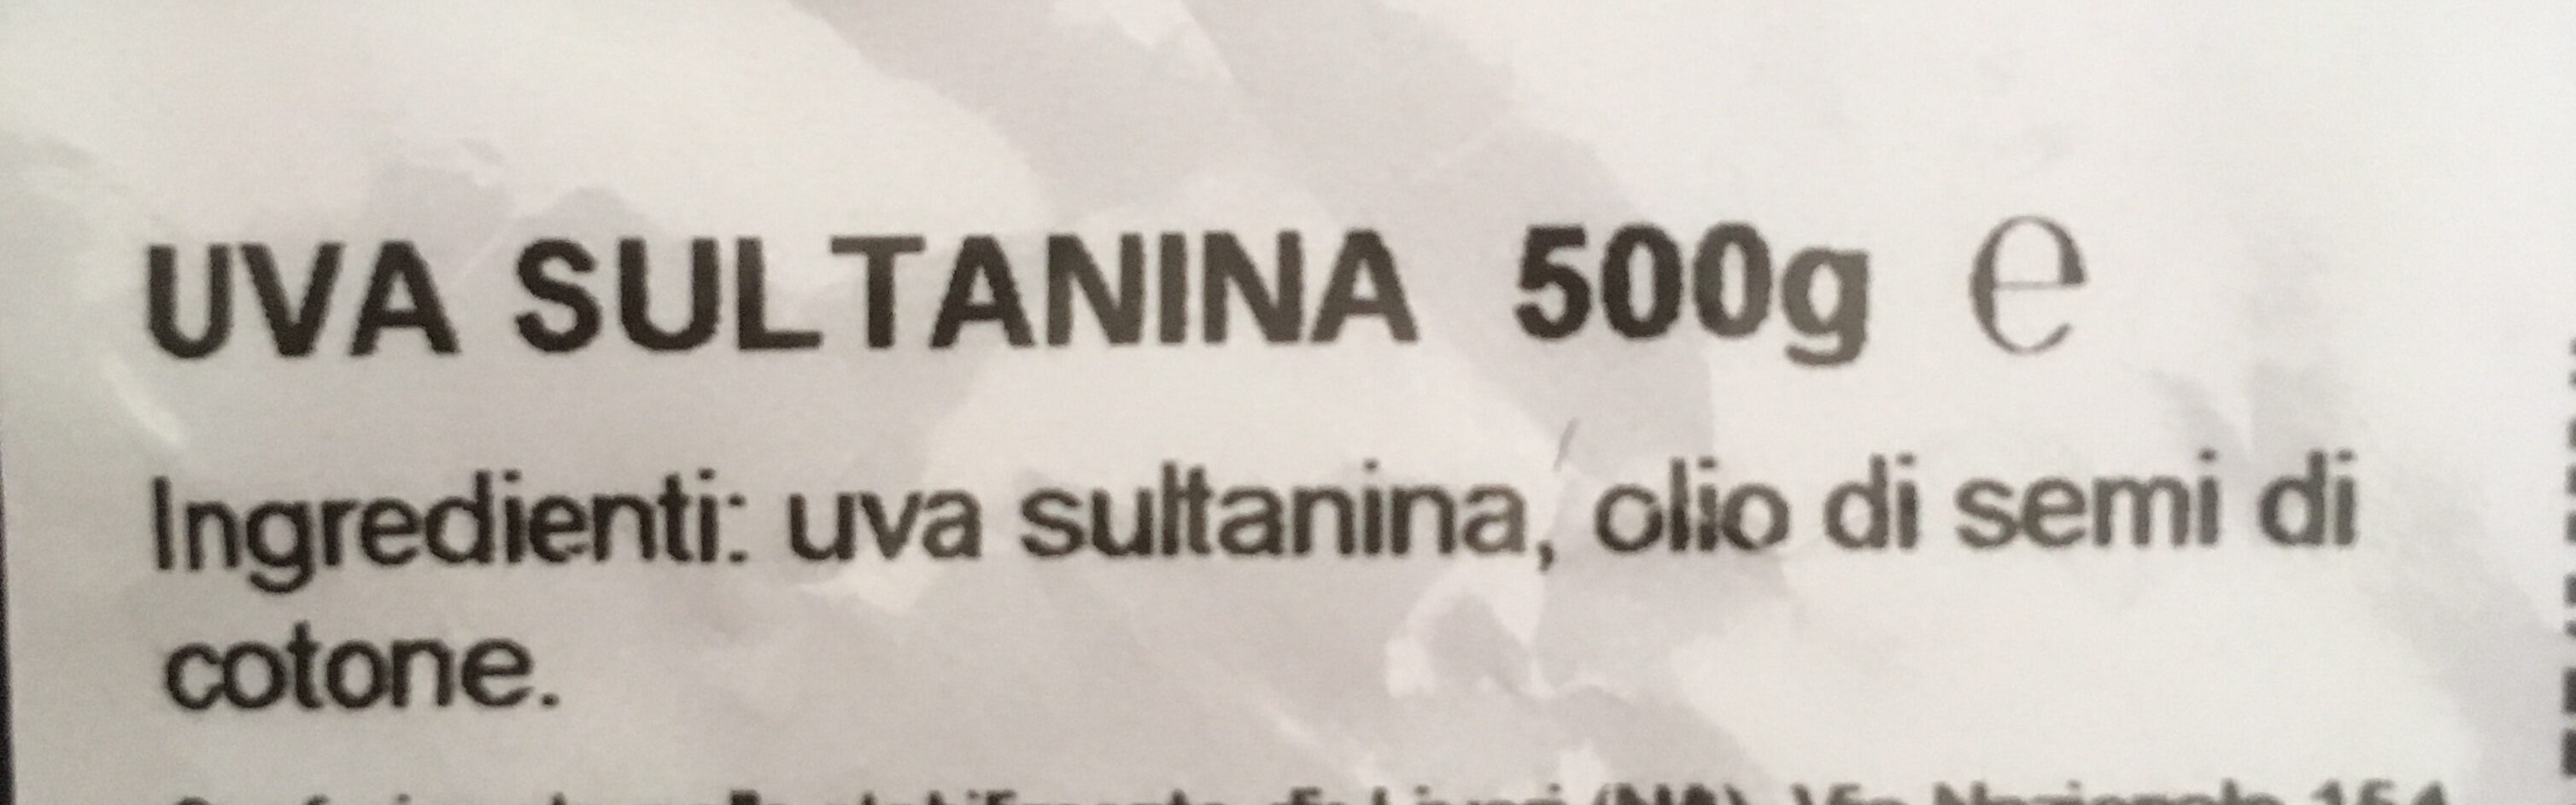 Uva sultanina - Ingredients - it